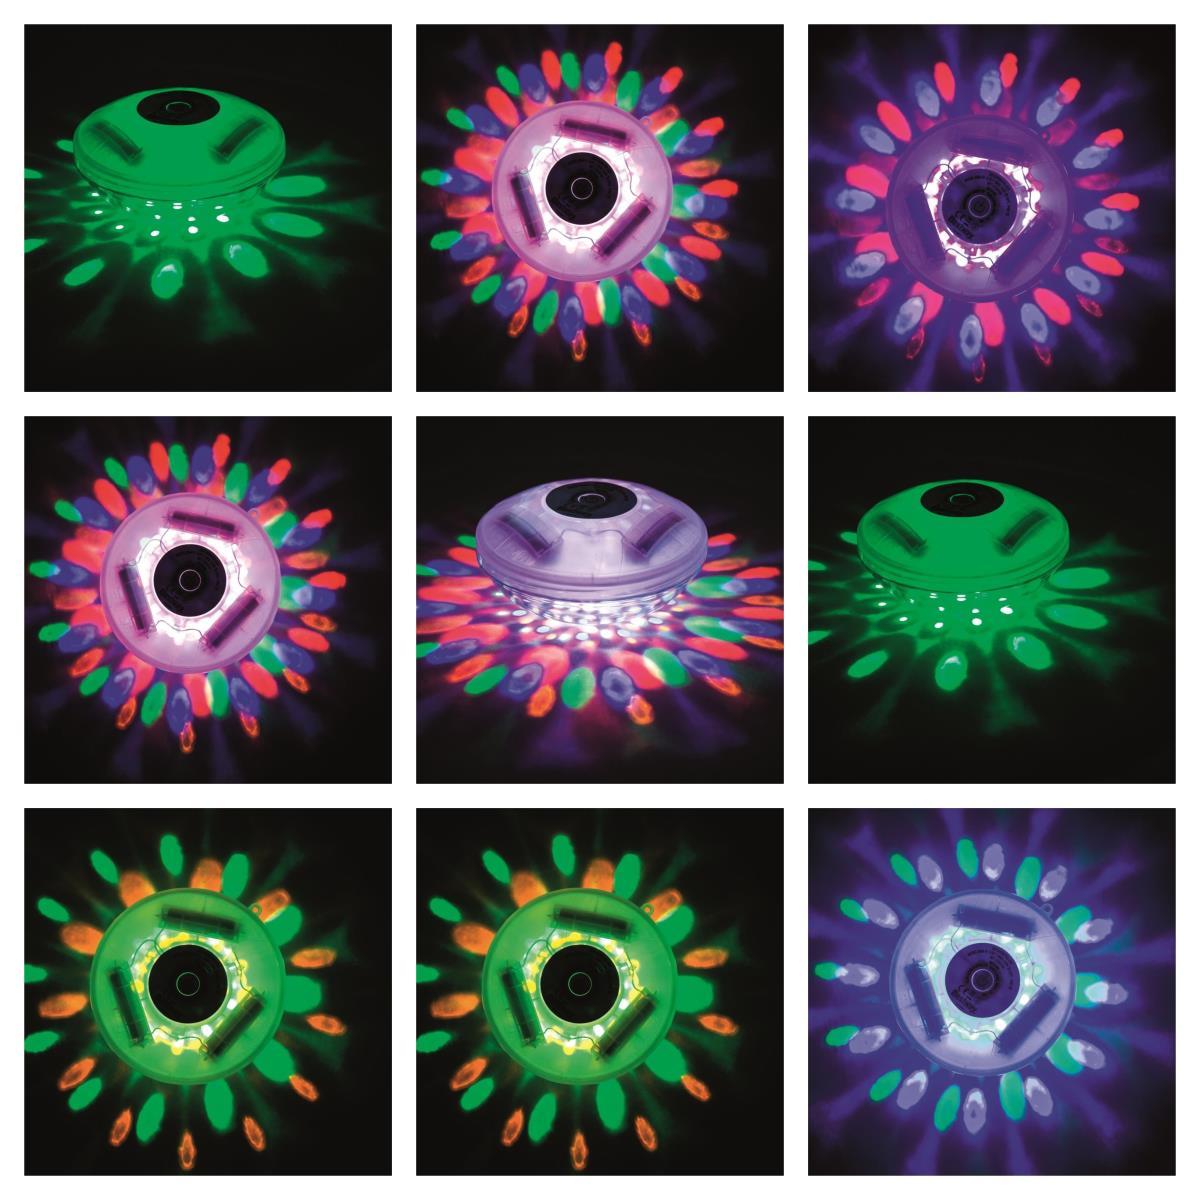 Bestway Flowclear LED Poolbeleuchtung schwimmende Unterwasserbeleuchtung Pool ,Bestway,58419, 6942138934939